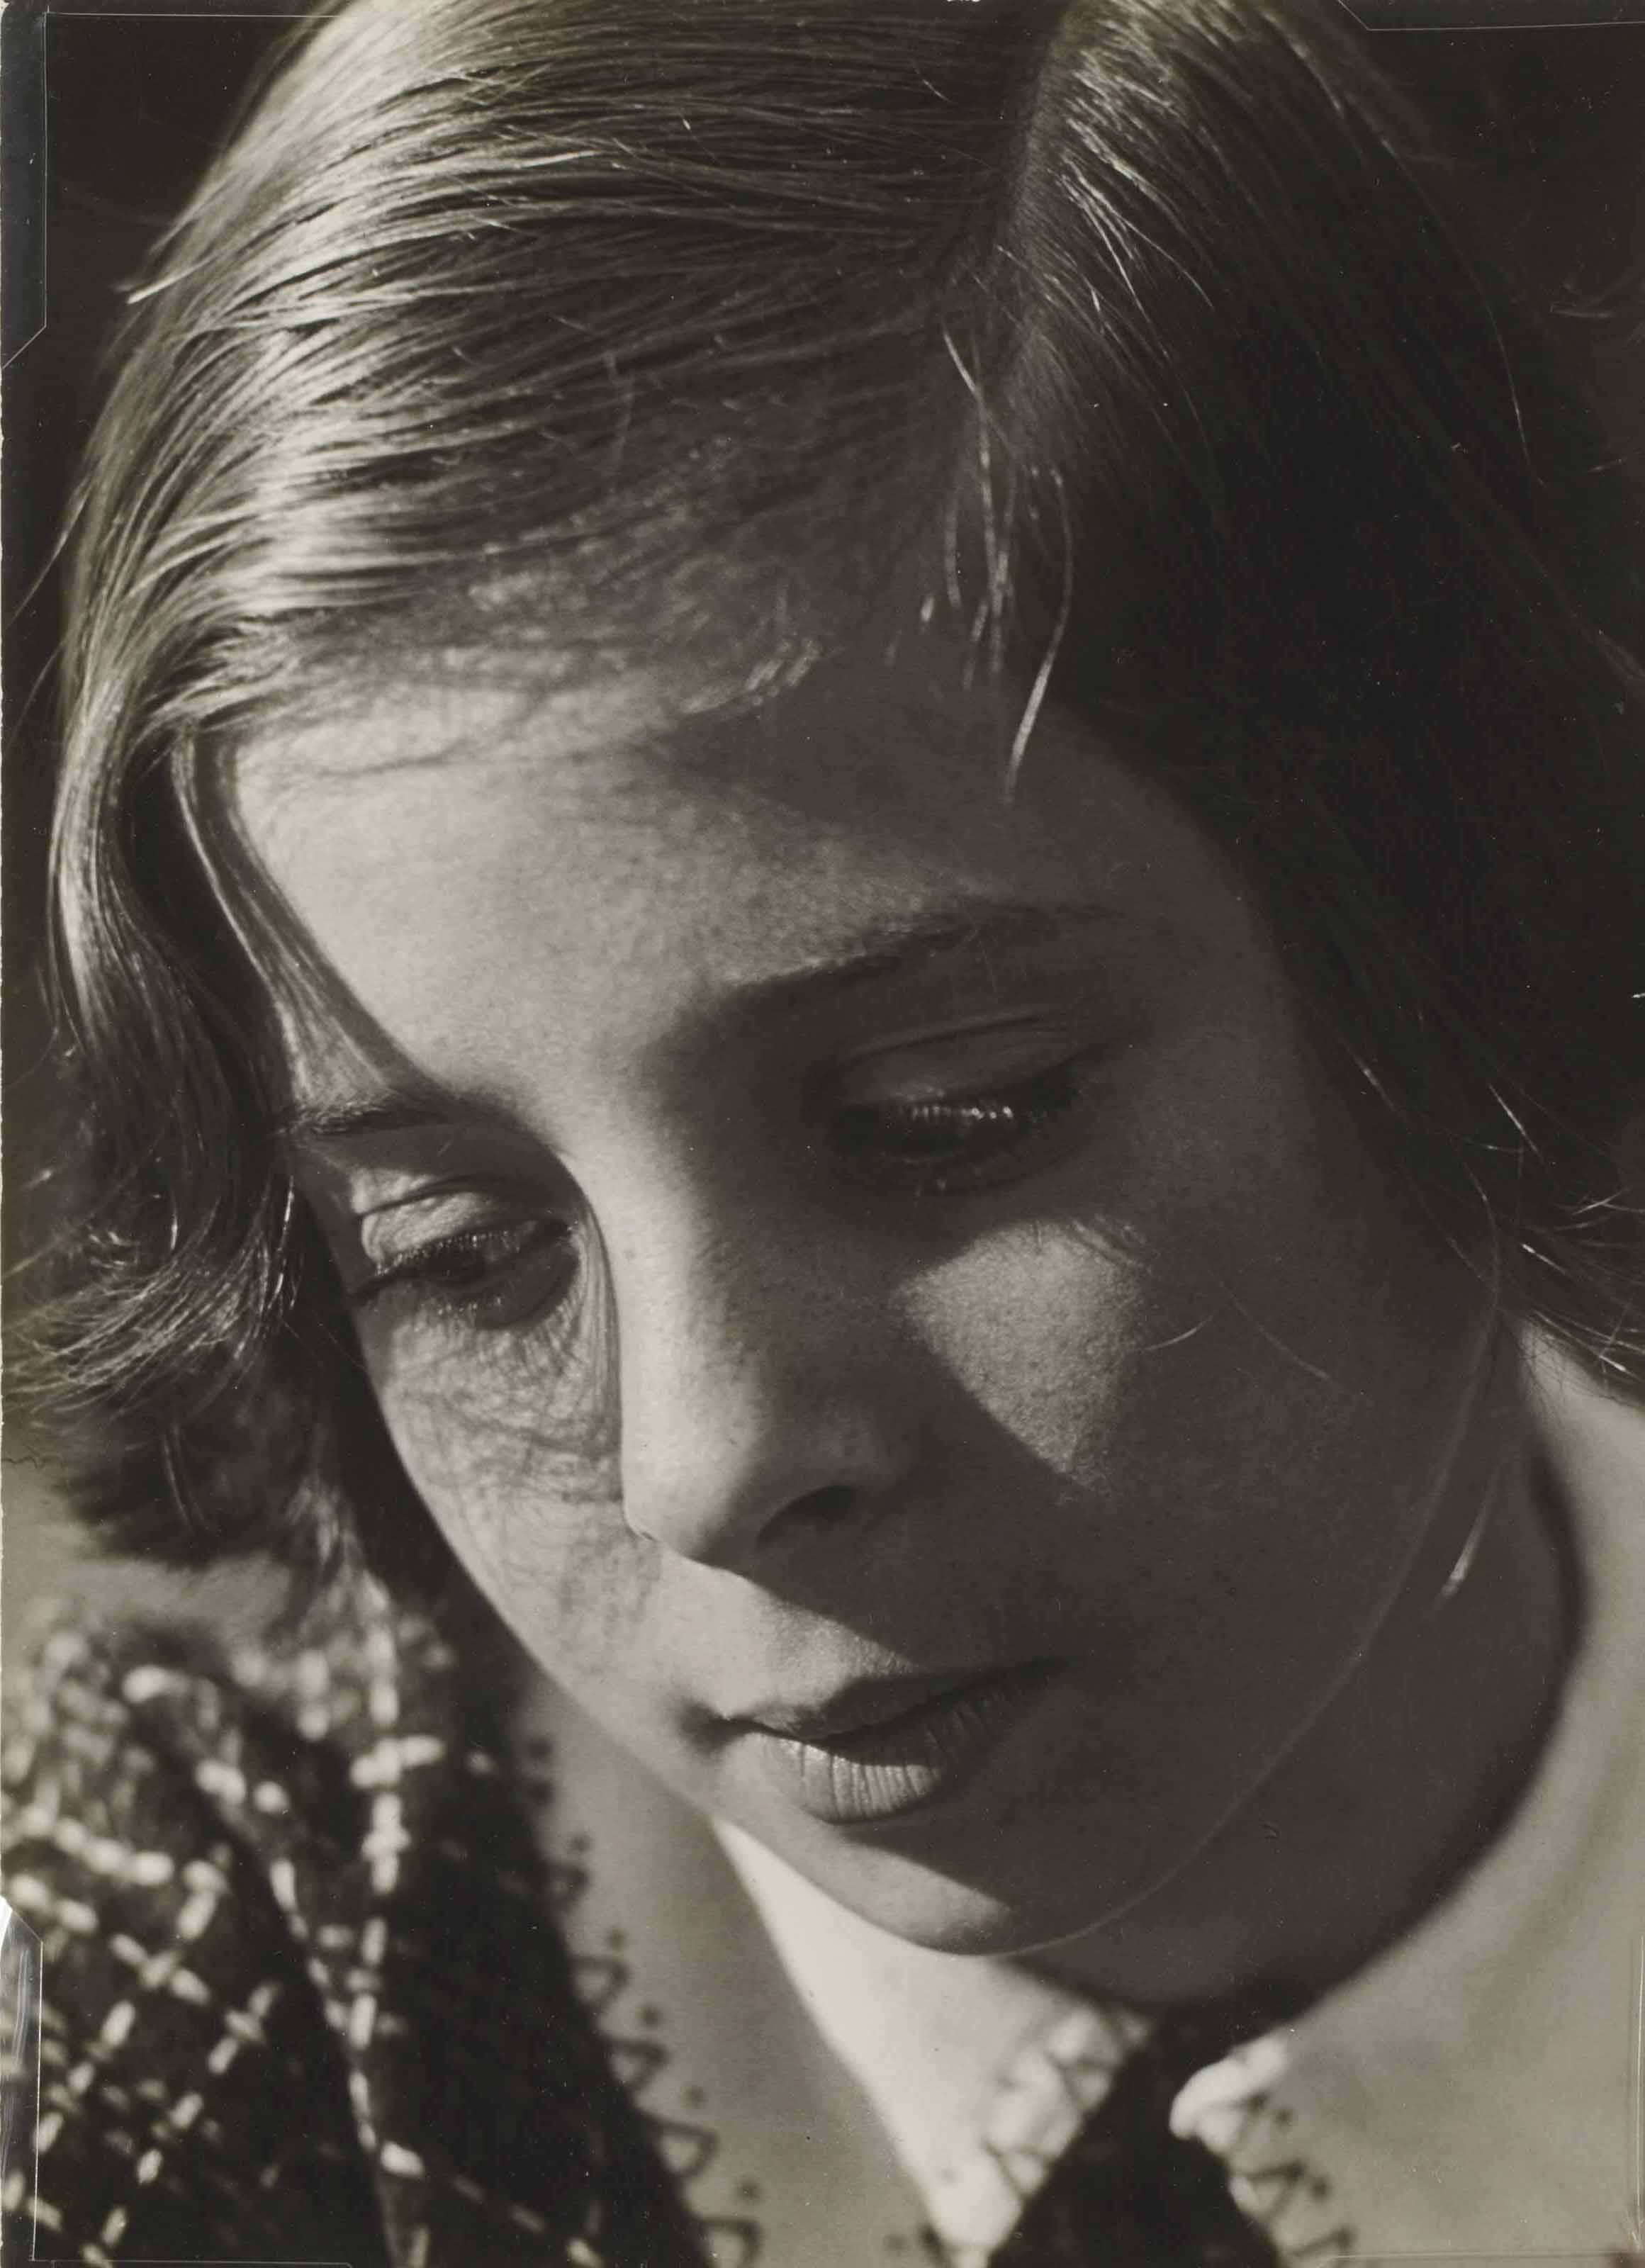 Mein kind (Helga Biermann, la fille du photographe), circa 1931